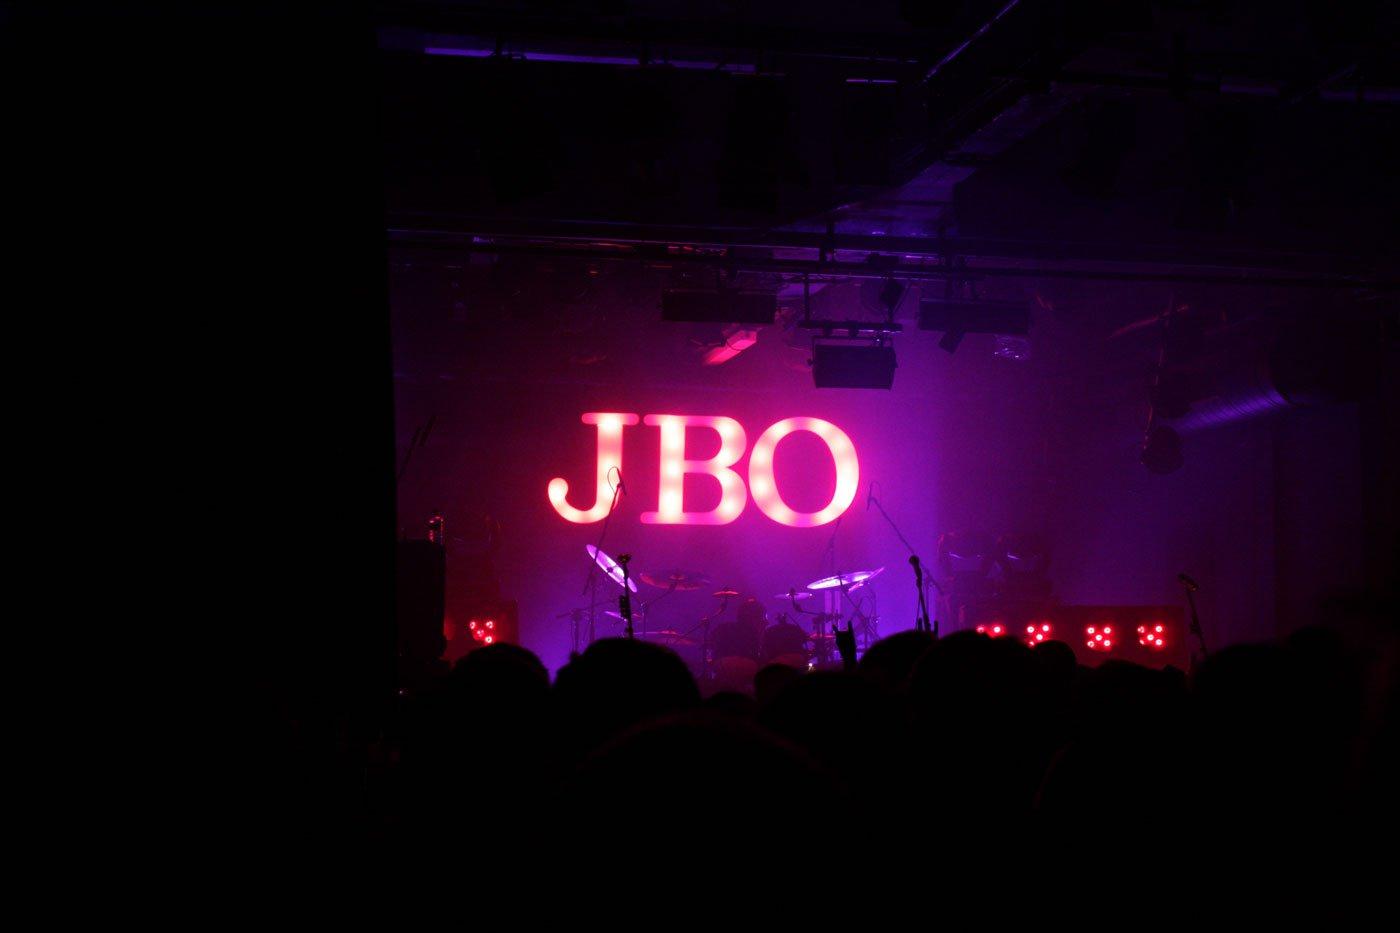 J.B.O. - Börse Wuppertal, 26.11.2010 - Foto von Florian Brinkmann - 001